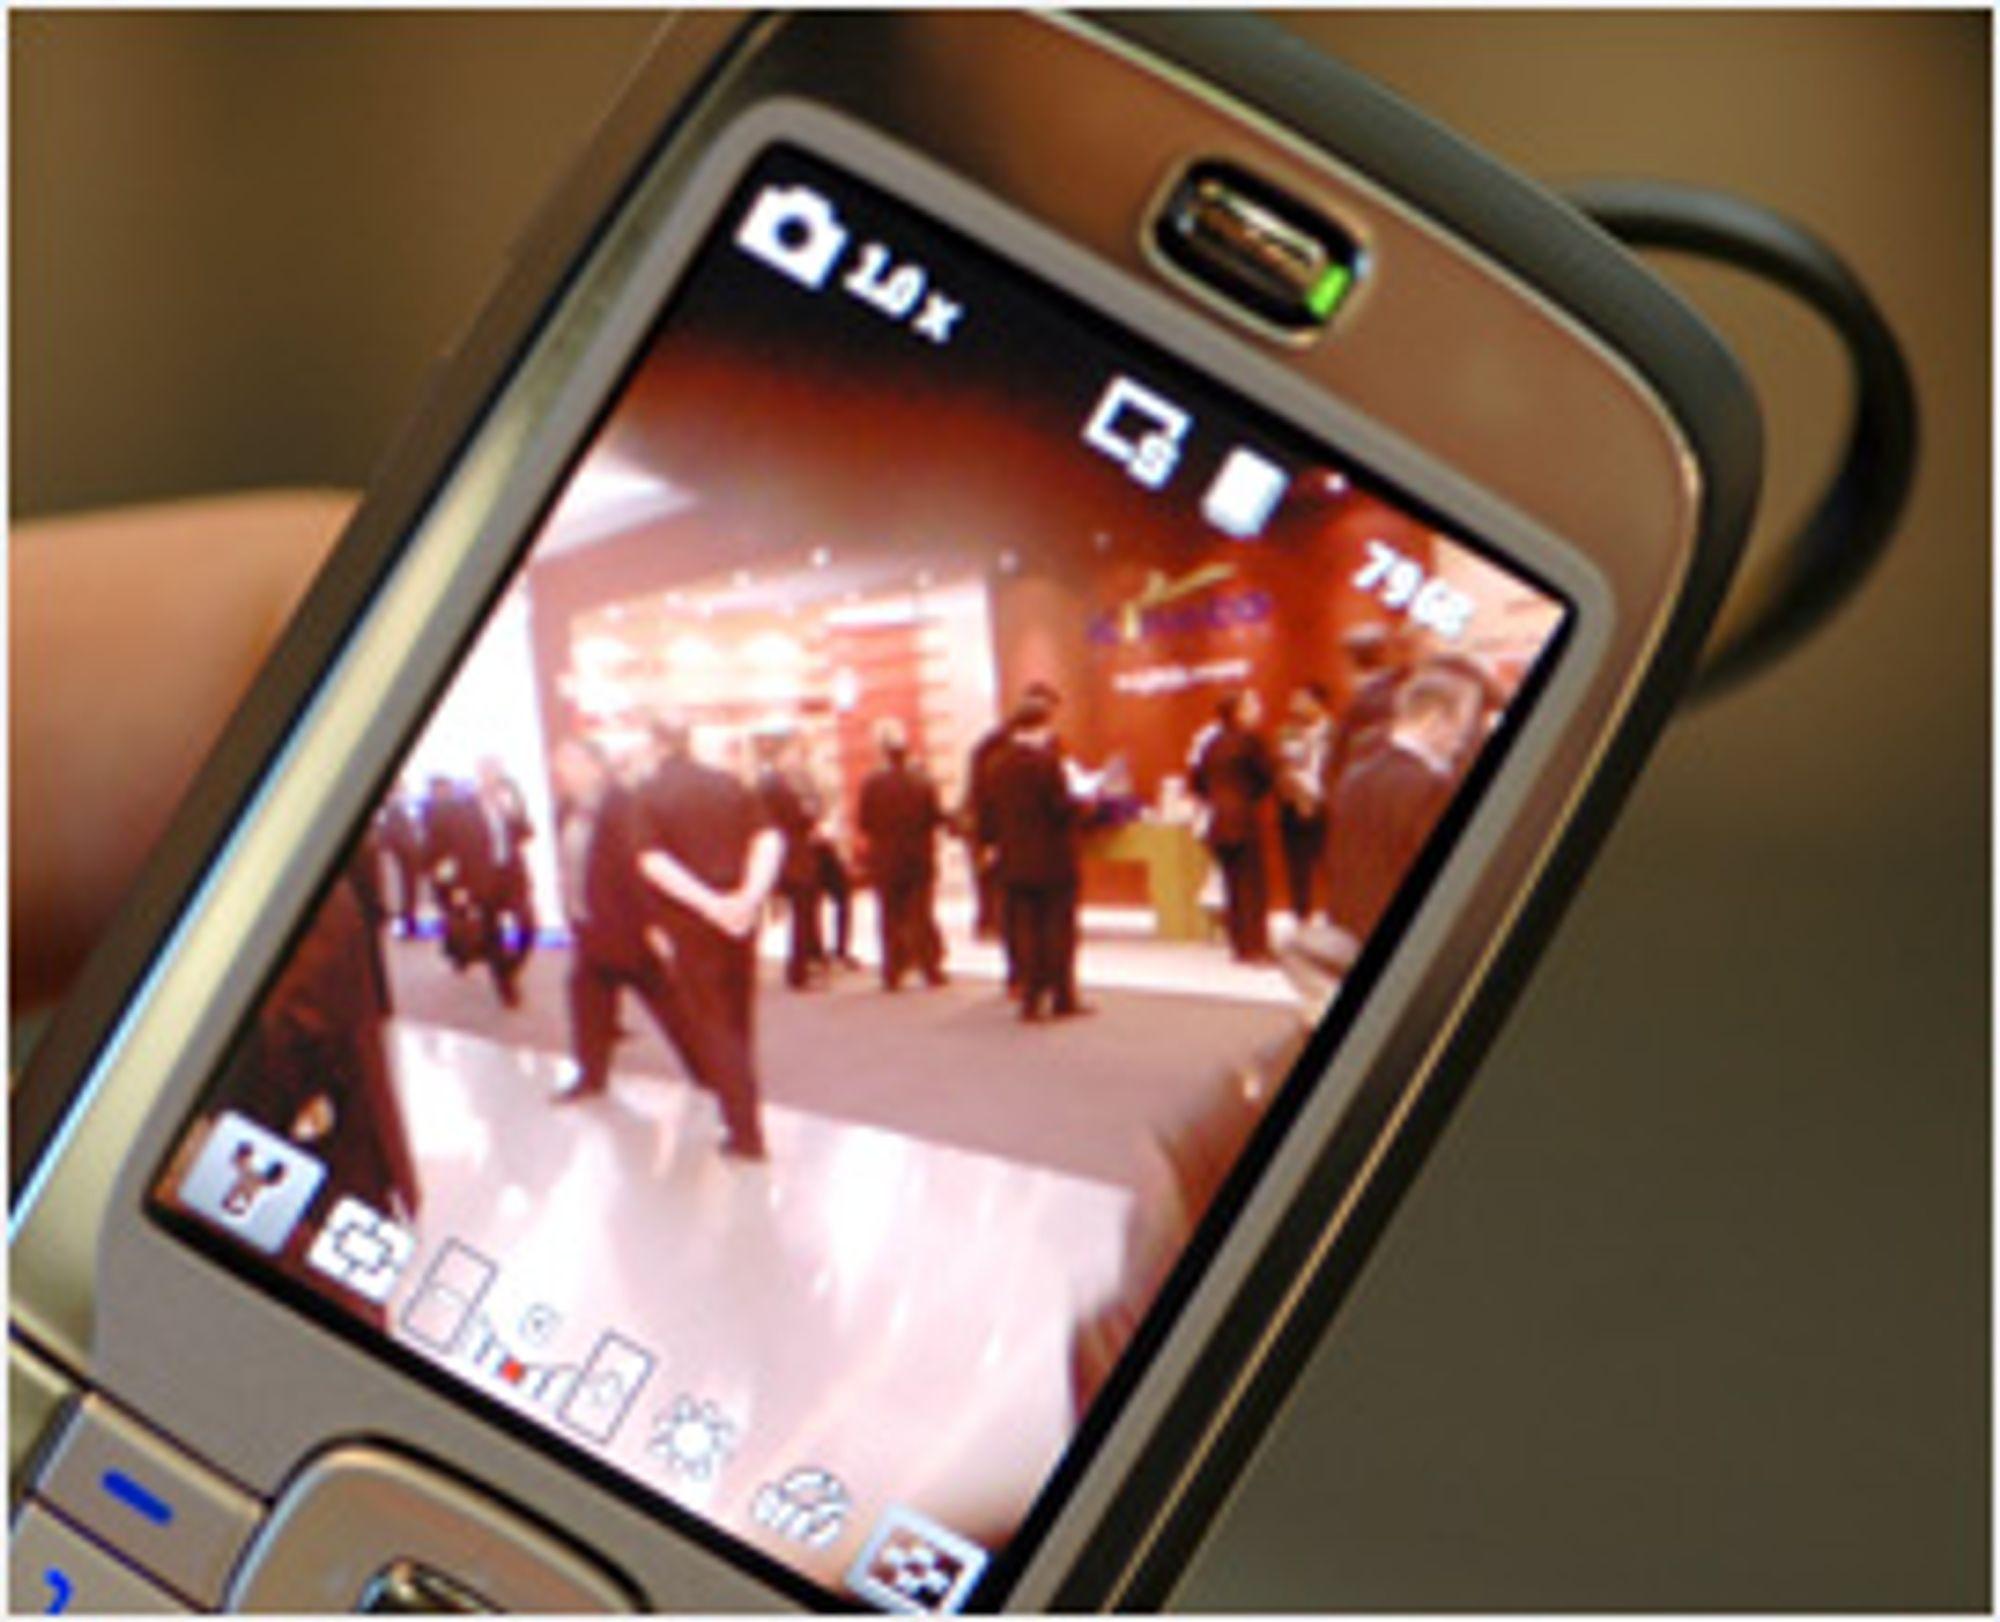 HTC S710 har to megapikslers kamera